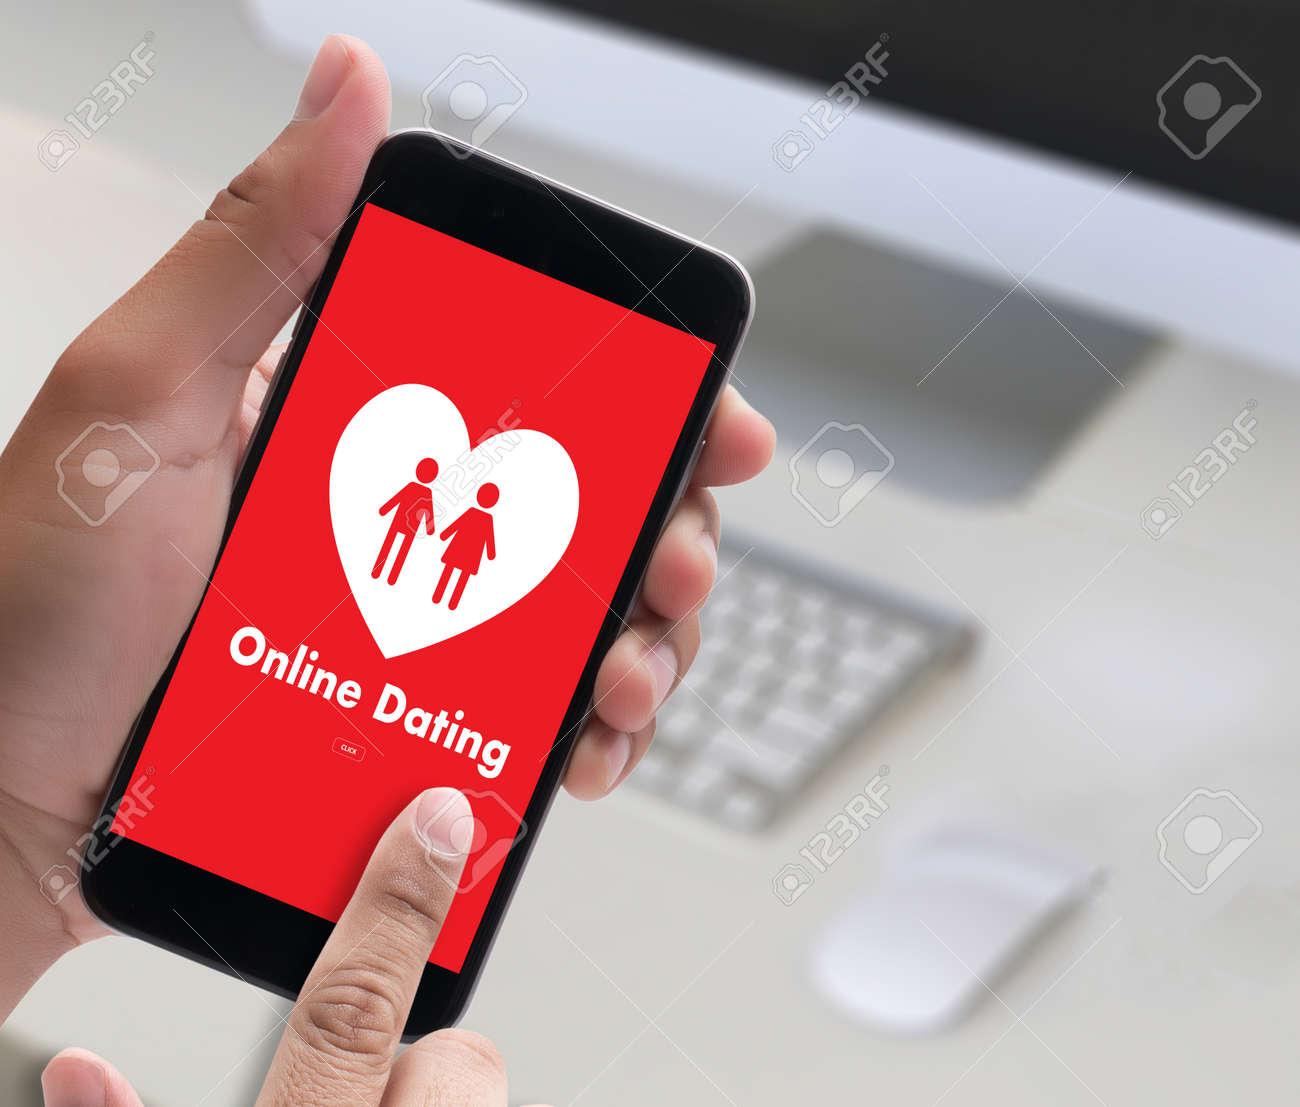 IPad dating apps UK